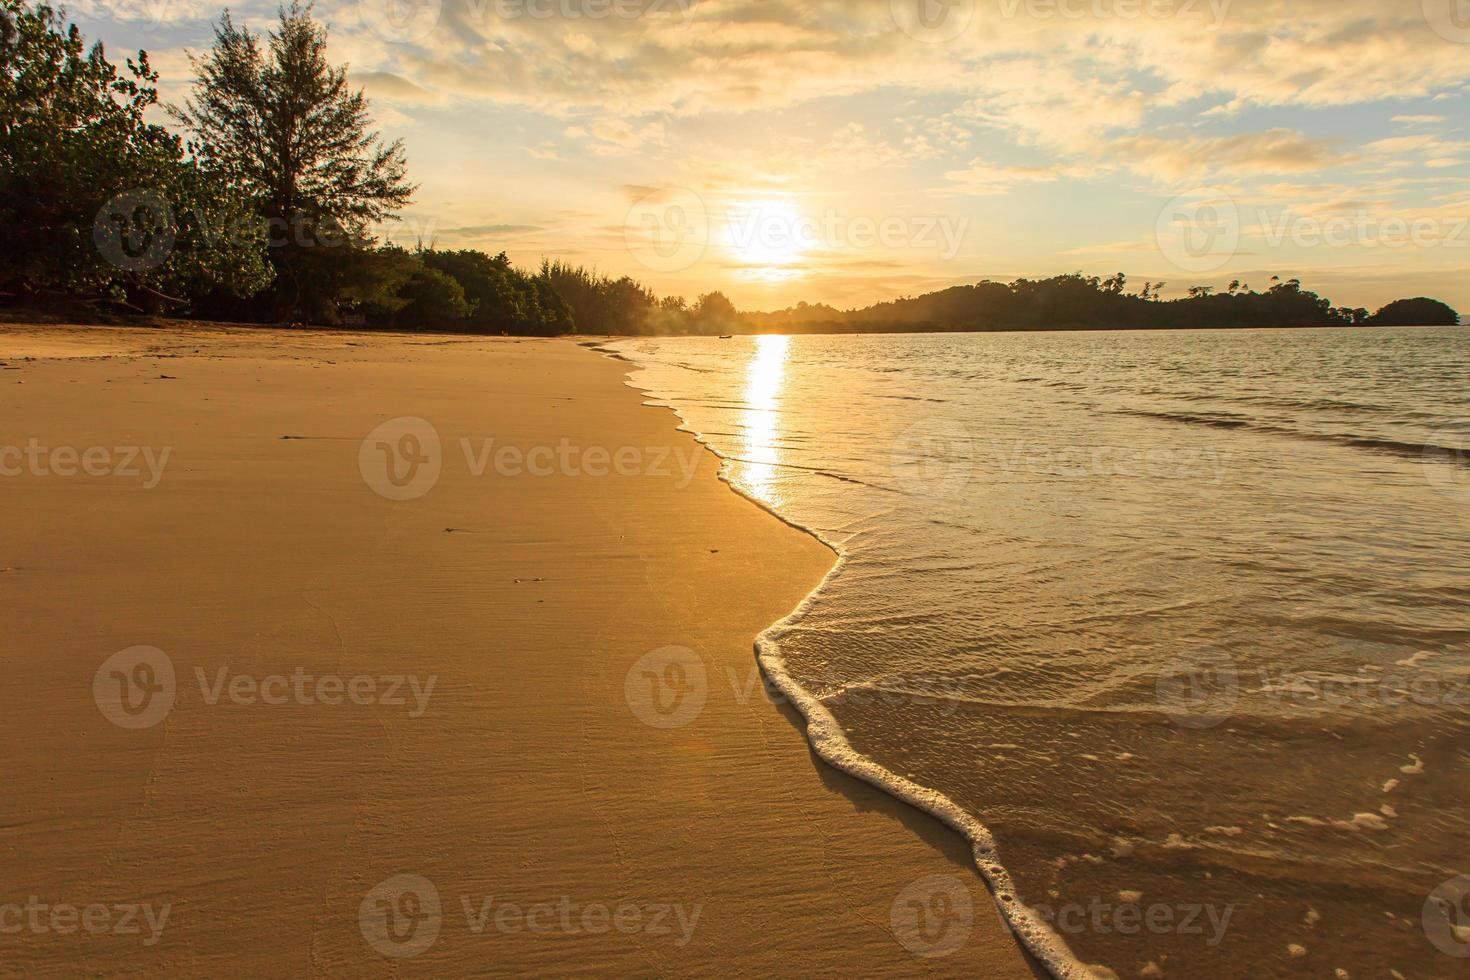 bellissimo tramonto panorama a kao kwai beach, isola di payam, thailandia foto